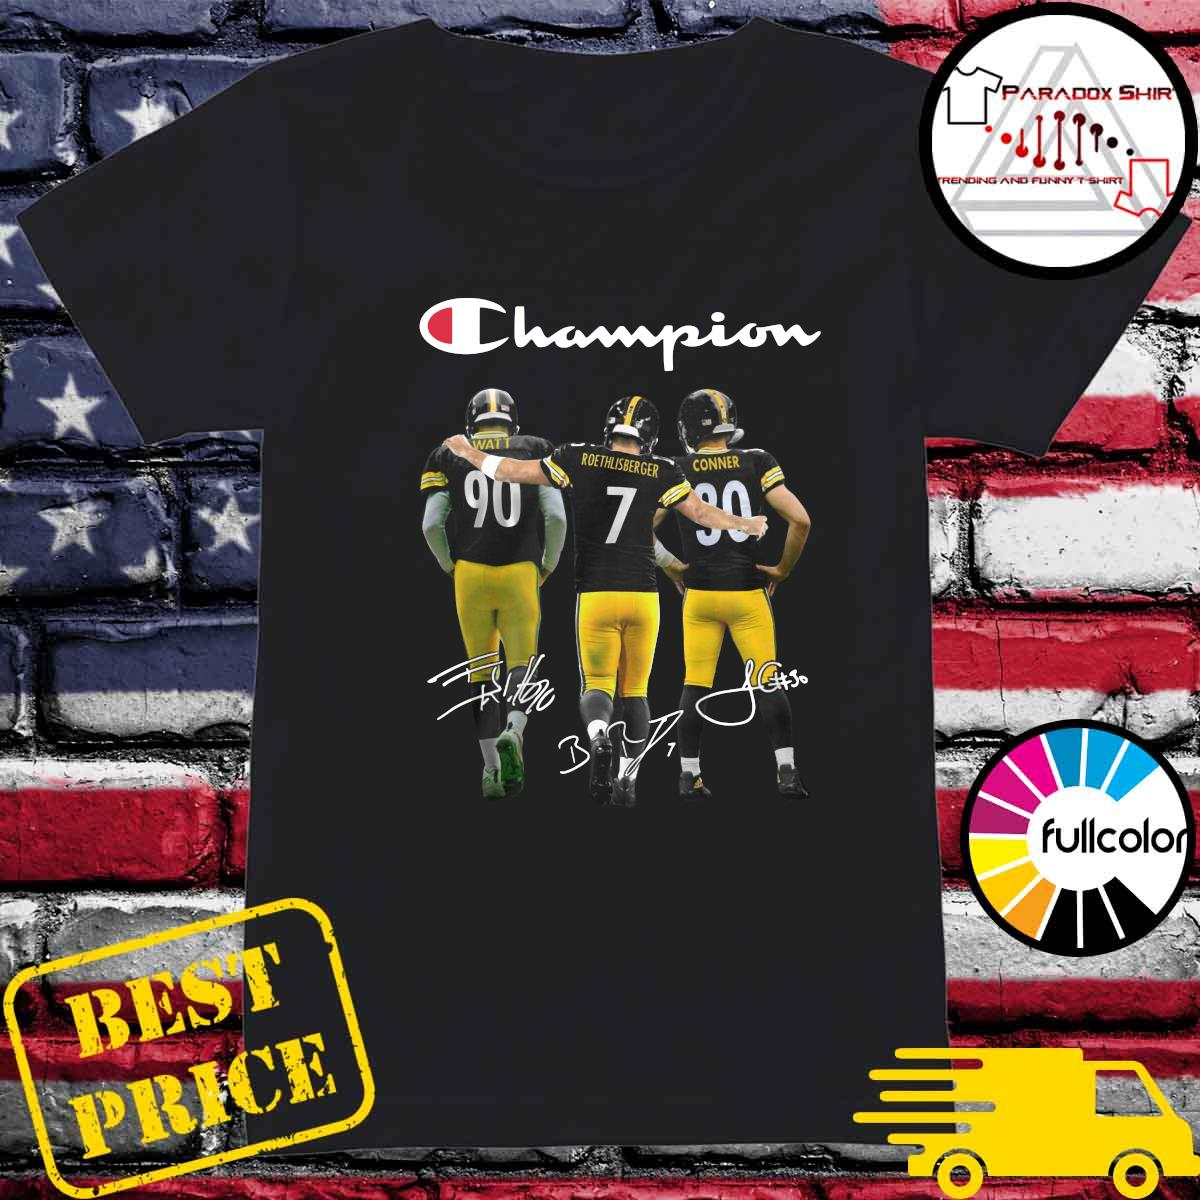 Champions Pittsburgh Steelers T J Watt 90 Ben Roethlisberger 7 James Conner 30 Signatures Shirt Ladies